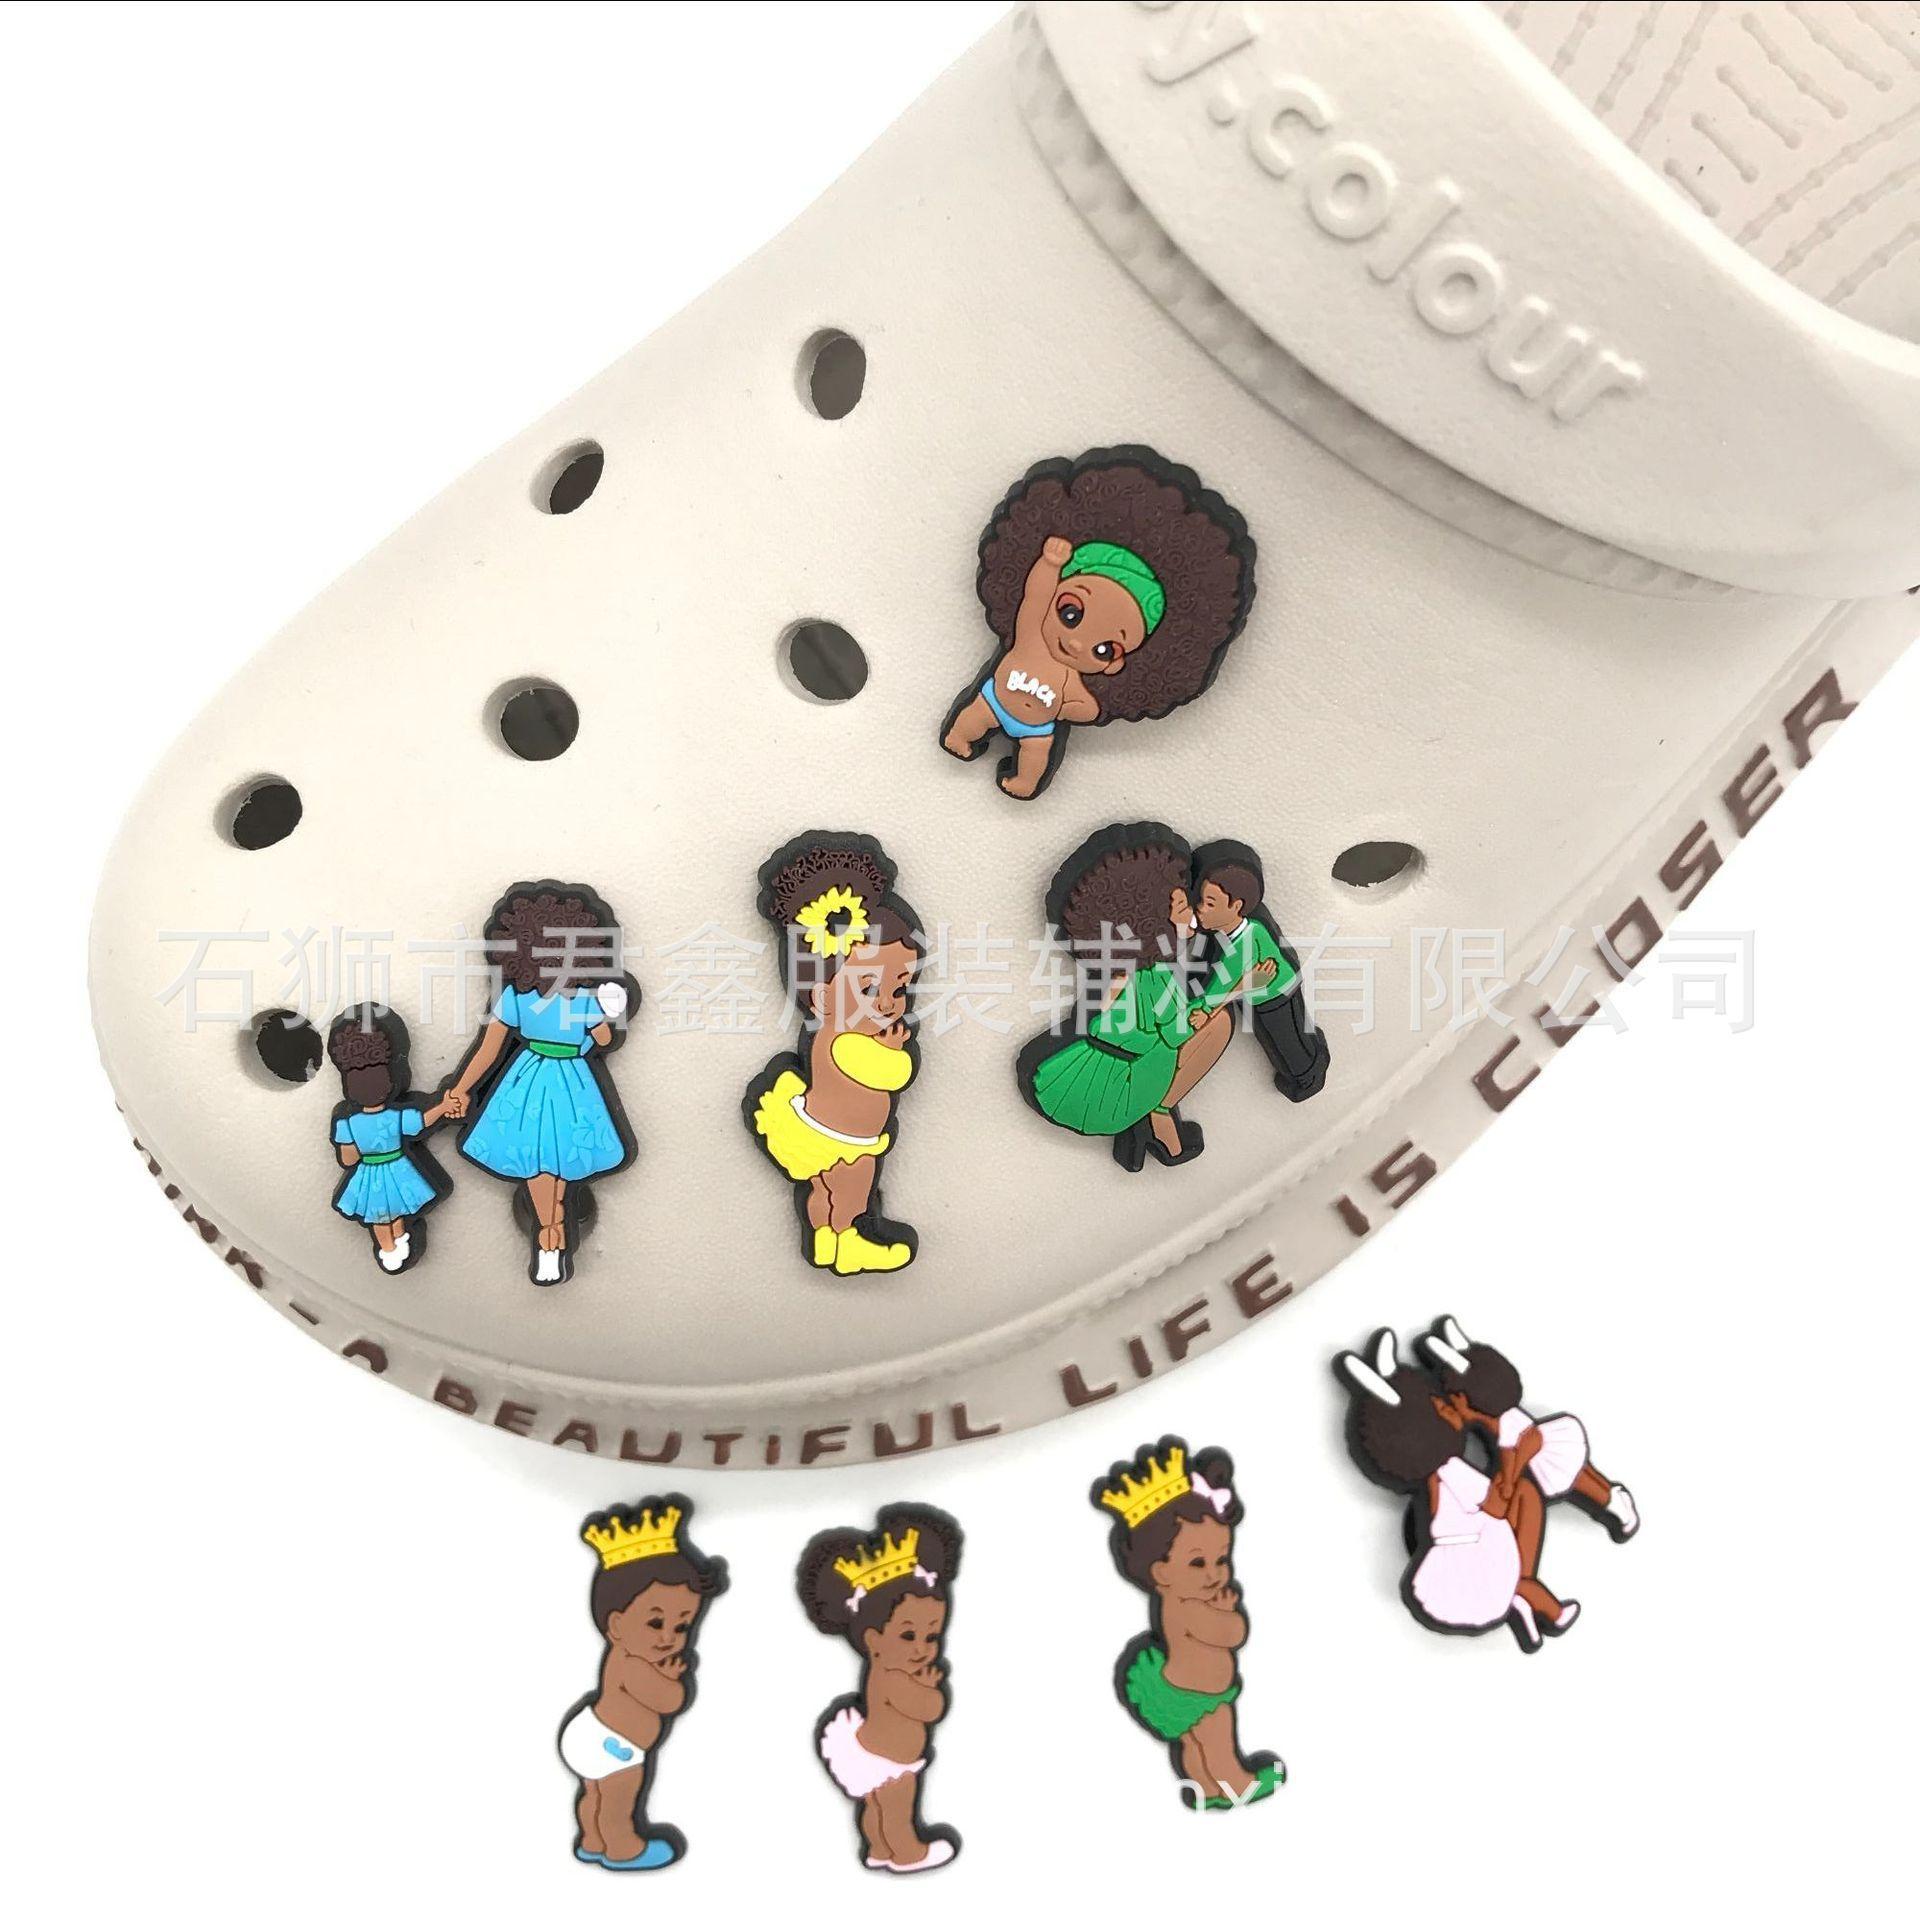 Black Lives Matter Shoe Charms BLM Black Girls Donne PVC Pin Pins Scarpe Decorazione per Croc Braccialetti Nero Baby Boy Girl Girl Favors Bomboniere Compleanno Gifts DHL GRATIS